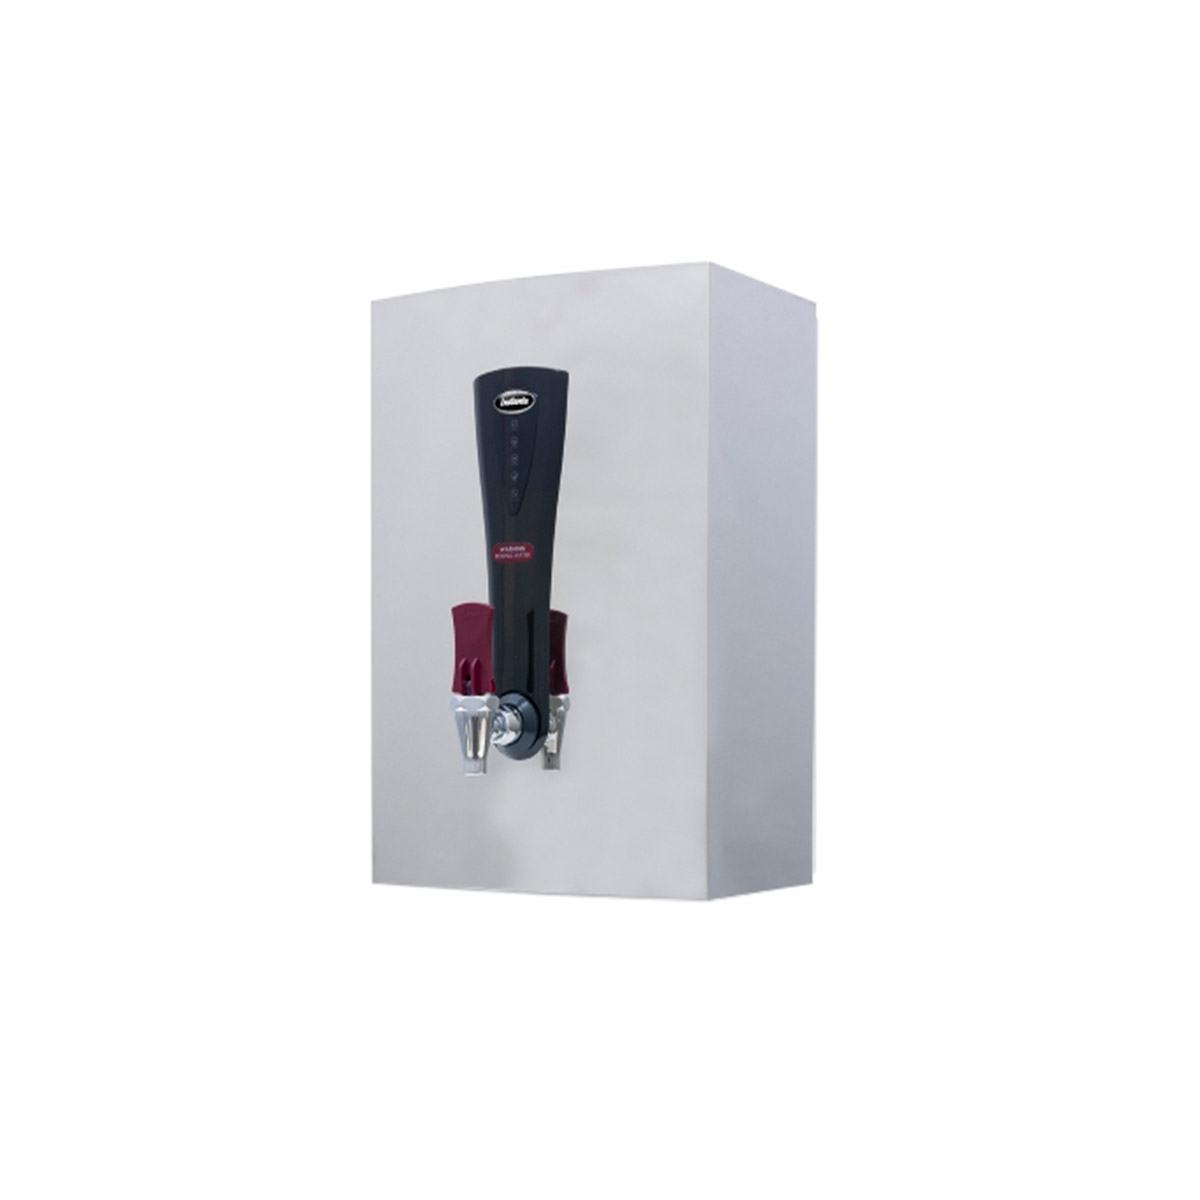 Instanta Sureflow Wall Mounted Water Boiler WMS10 Mirror Finish 10Ltr